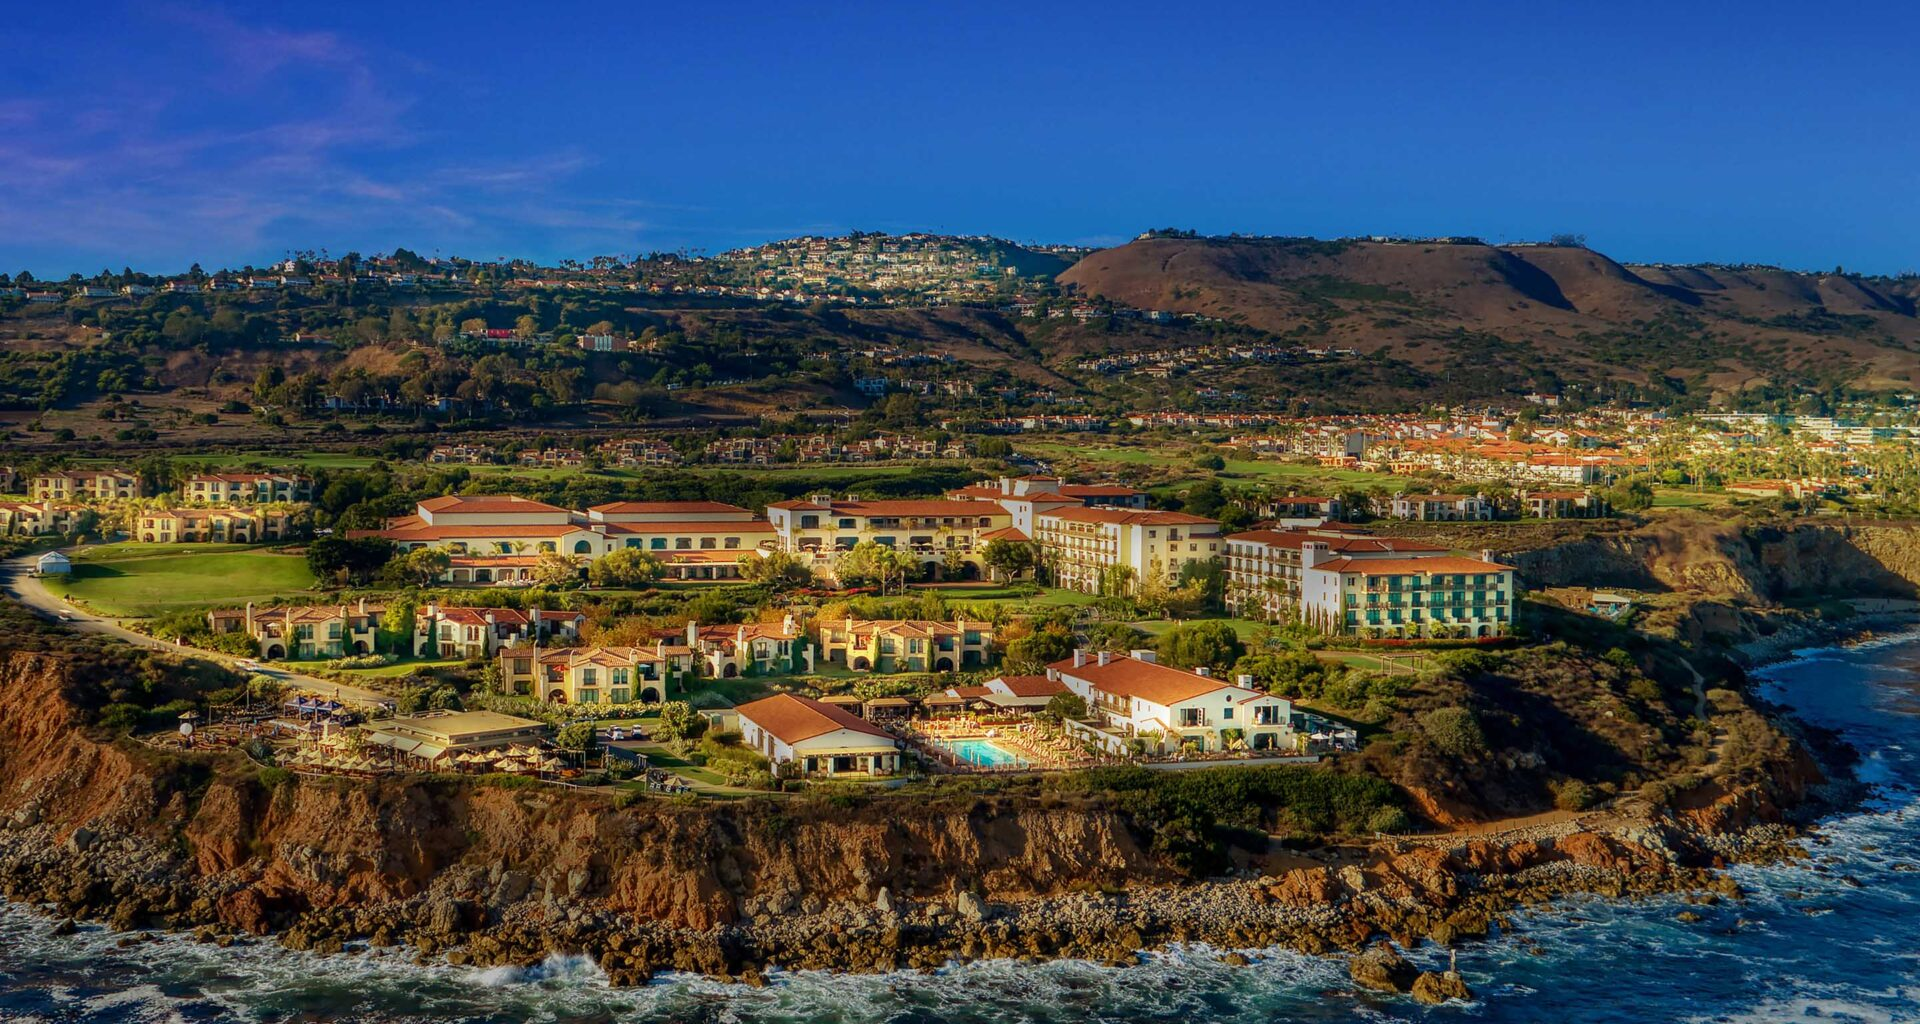 terranea resort, villas at terranea, villa, resort, Marika Kalogerakis, Terranea Real Estate